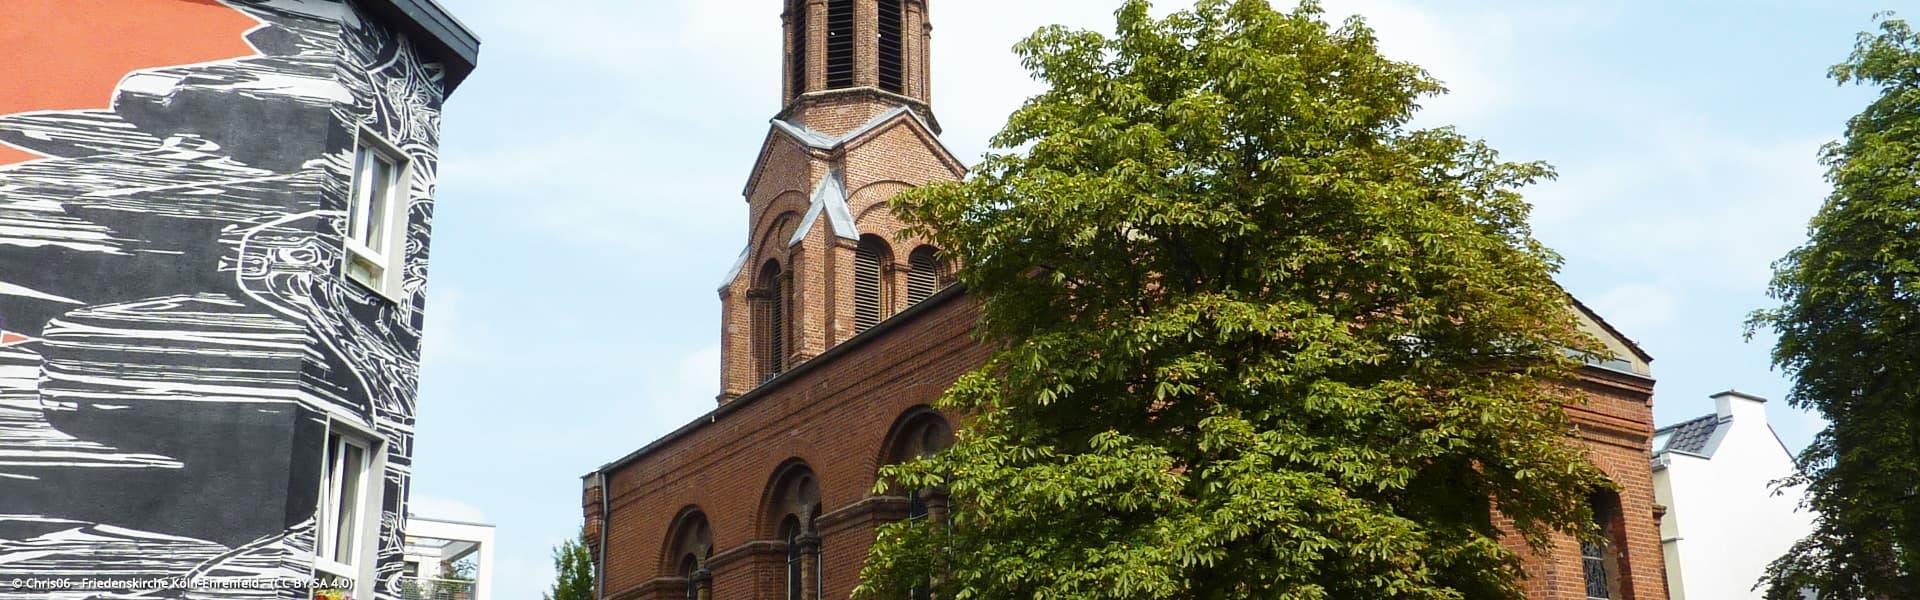 Friedenskirche Köln-Ehrenfeld